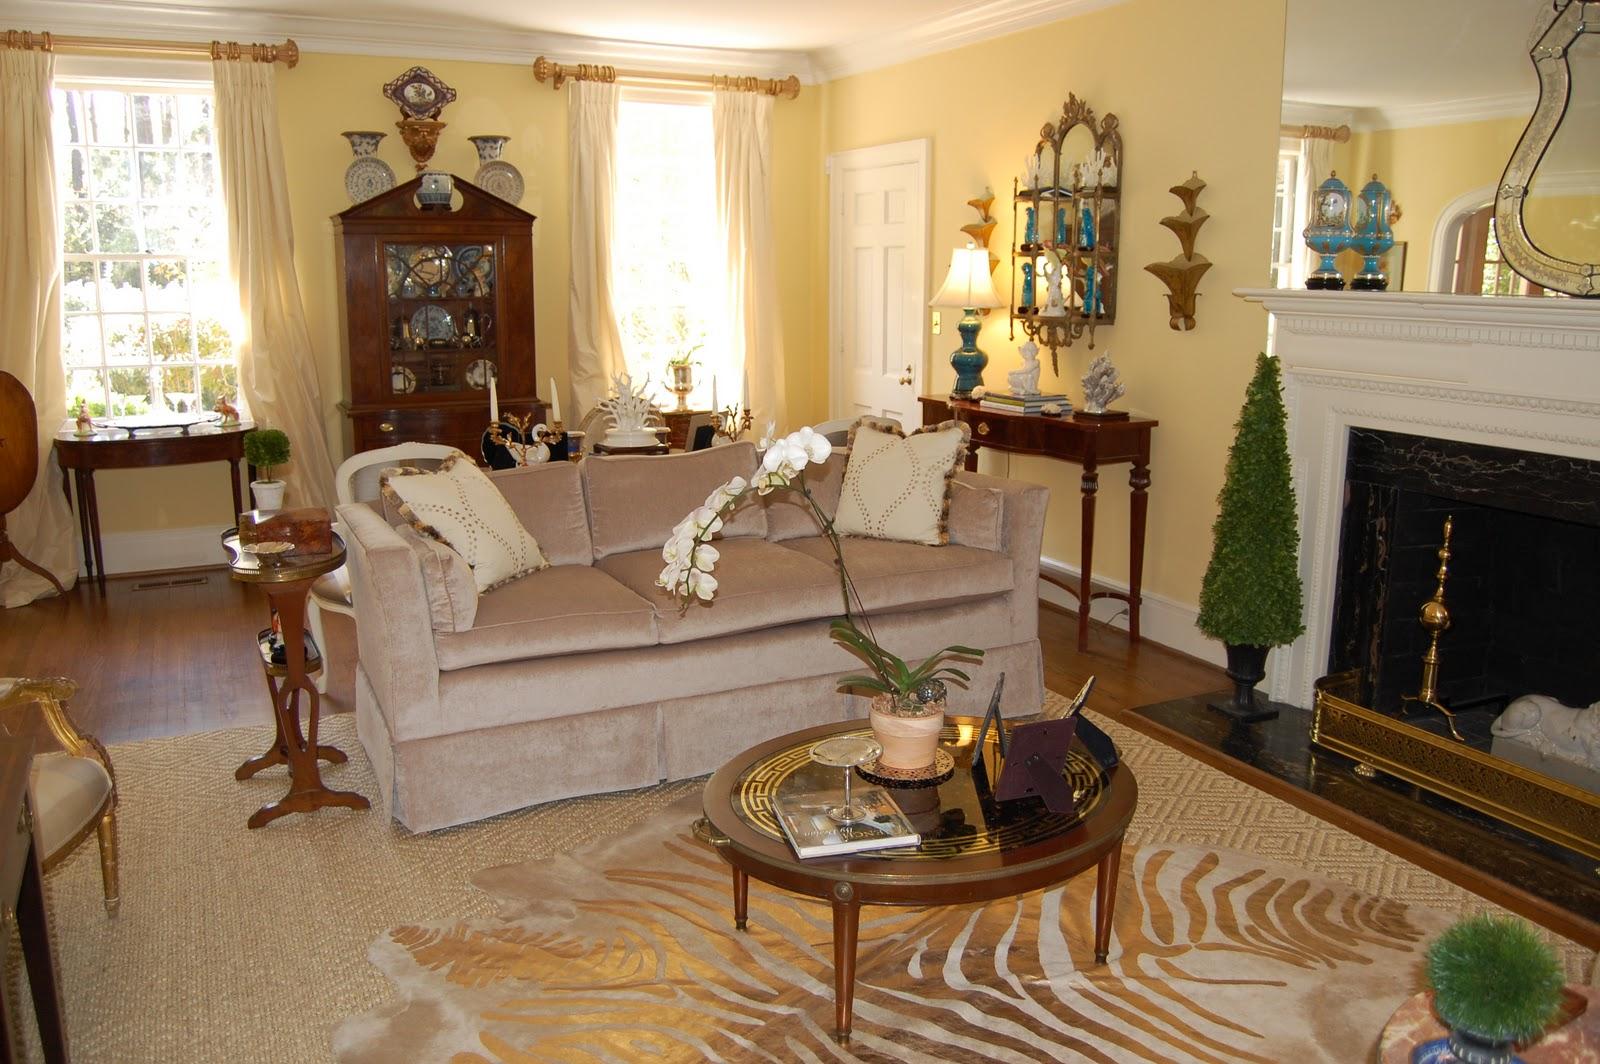 http://1.bp.blogspot.com/-HTOOKZSV1EQ/TaYmlqDNrtI/AAAAAAAAAgw/Zq0A7Q9ptNk/s1600/furniture+classics+tuxedo+sofa+birdsofafeatherdesign.JPG